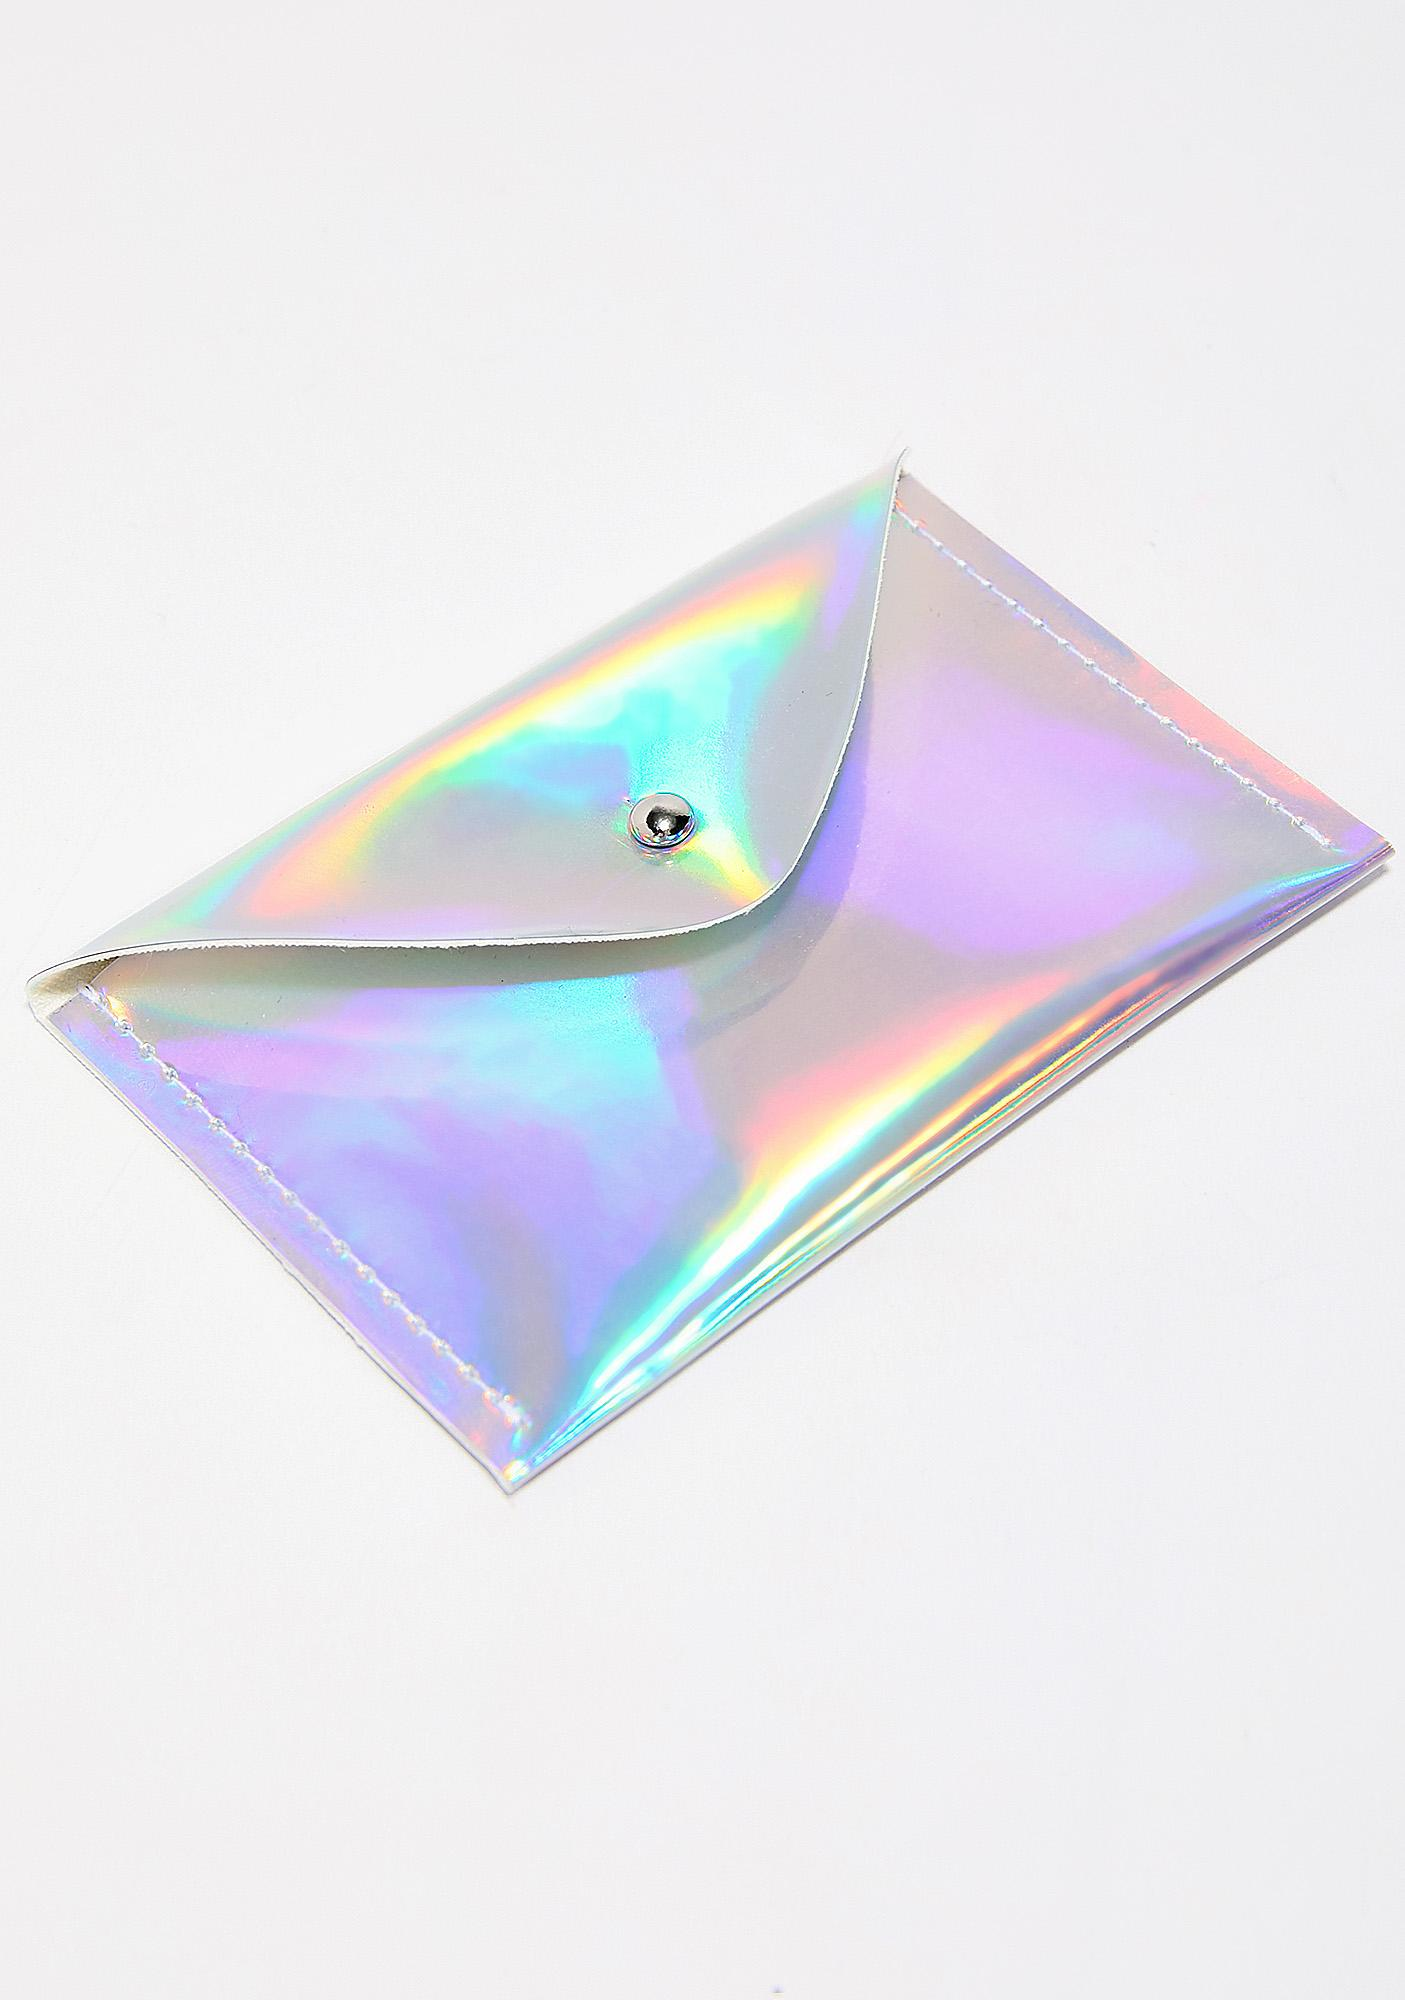 Poco Inu Holographic Card Holder